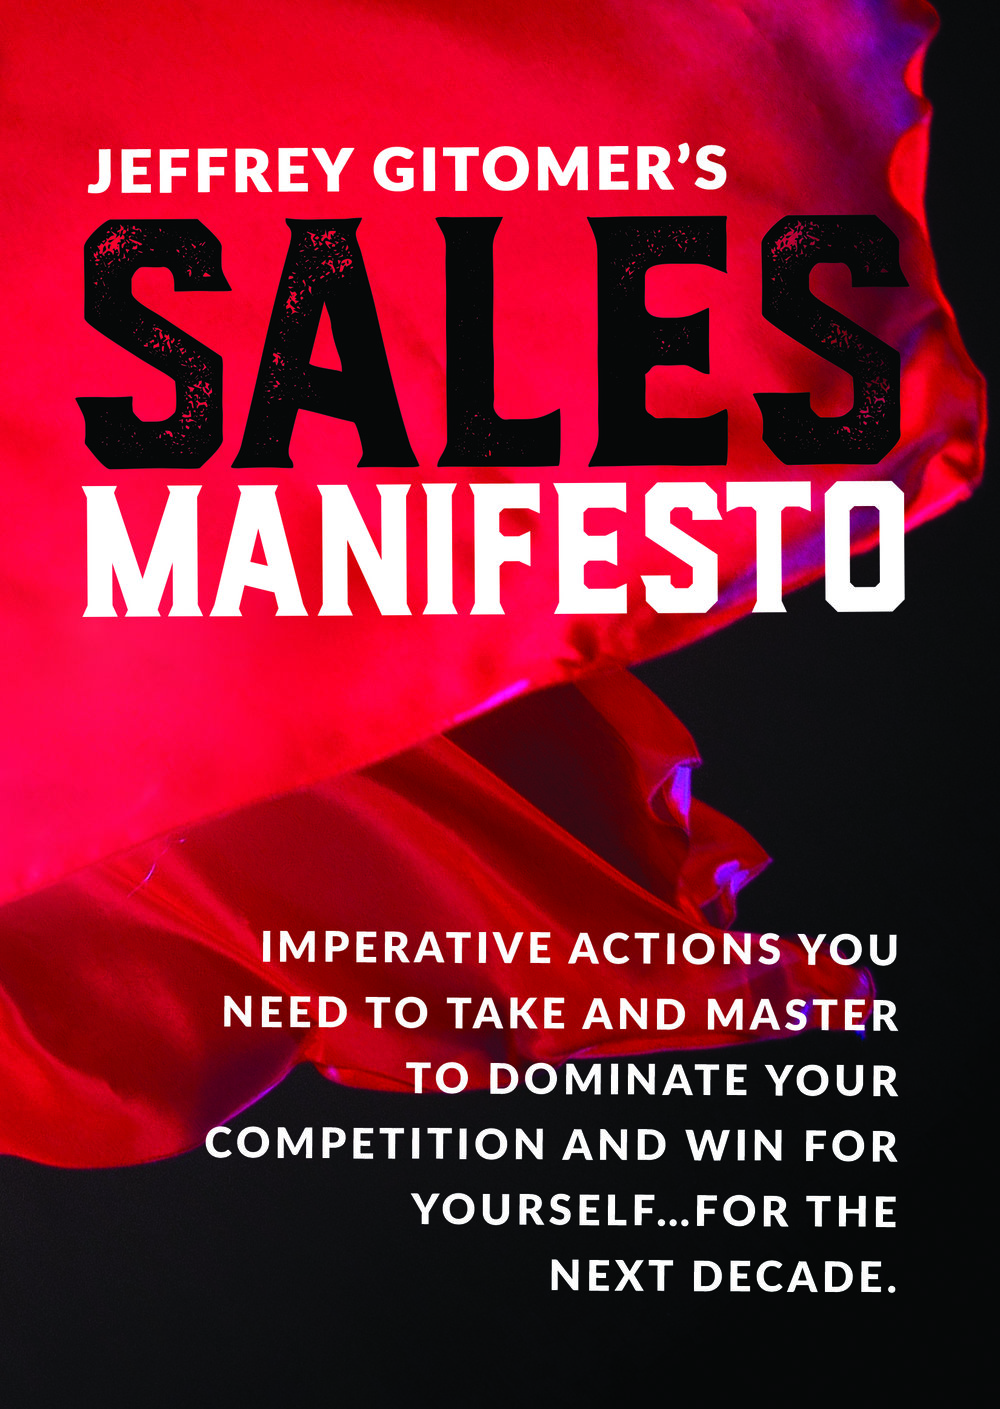 Jeffrey Gitomer's Sales Manifesto - By Jeffrey Gitomer